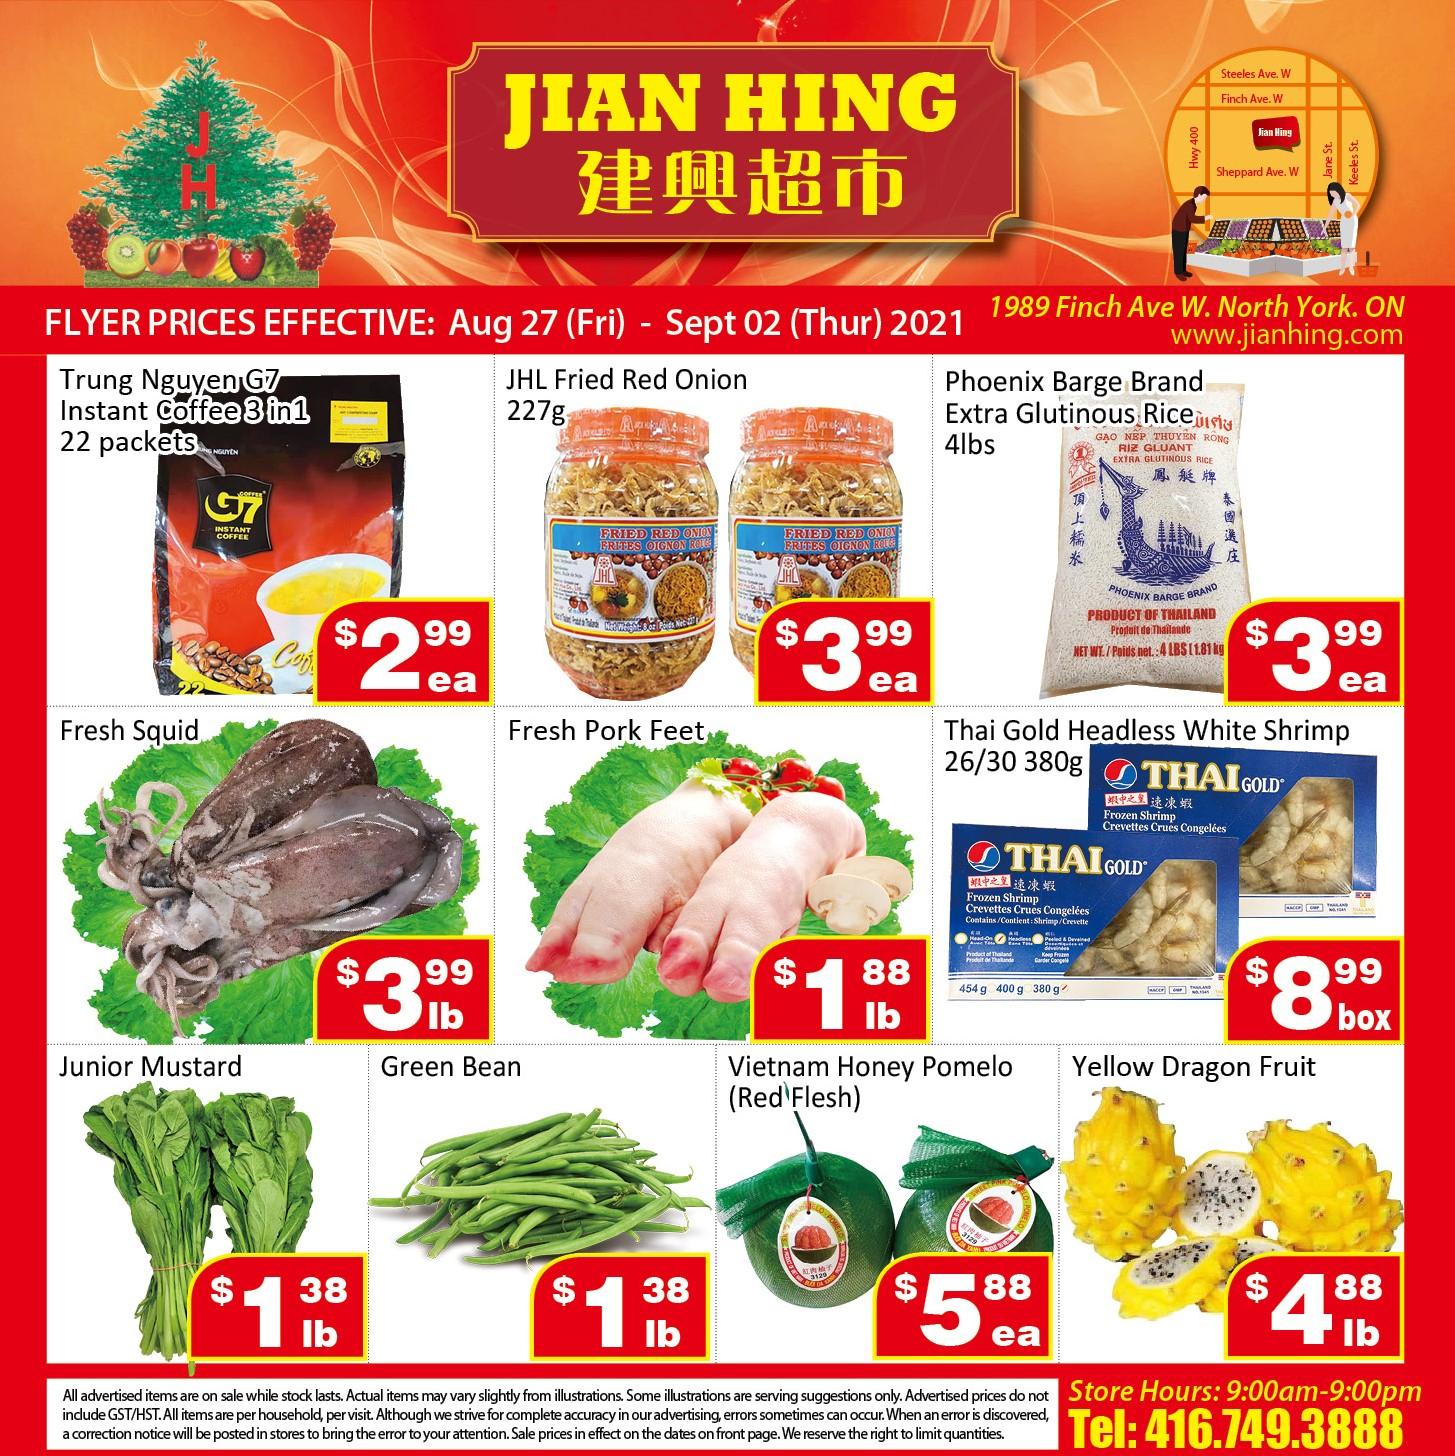 Jian Hing Supermarket Northyork Flyer | Aug 27